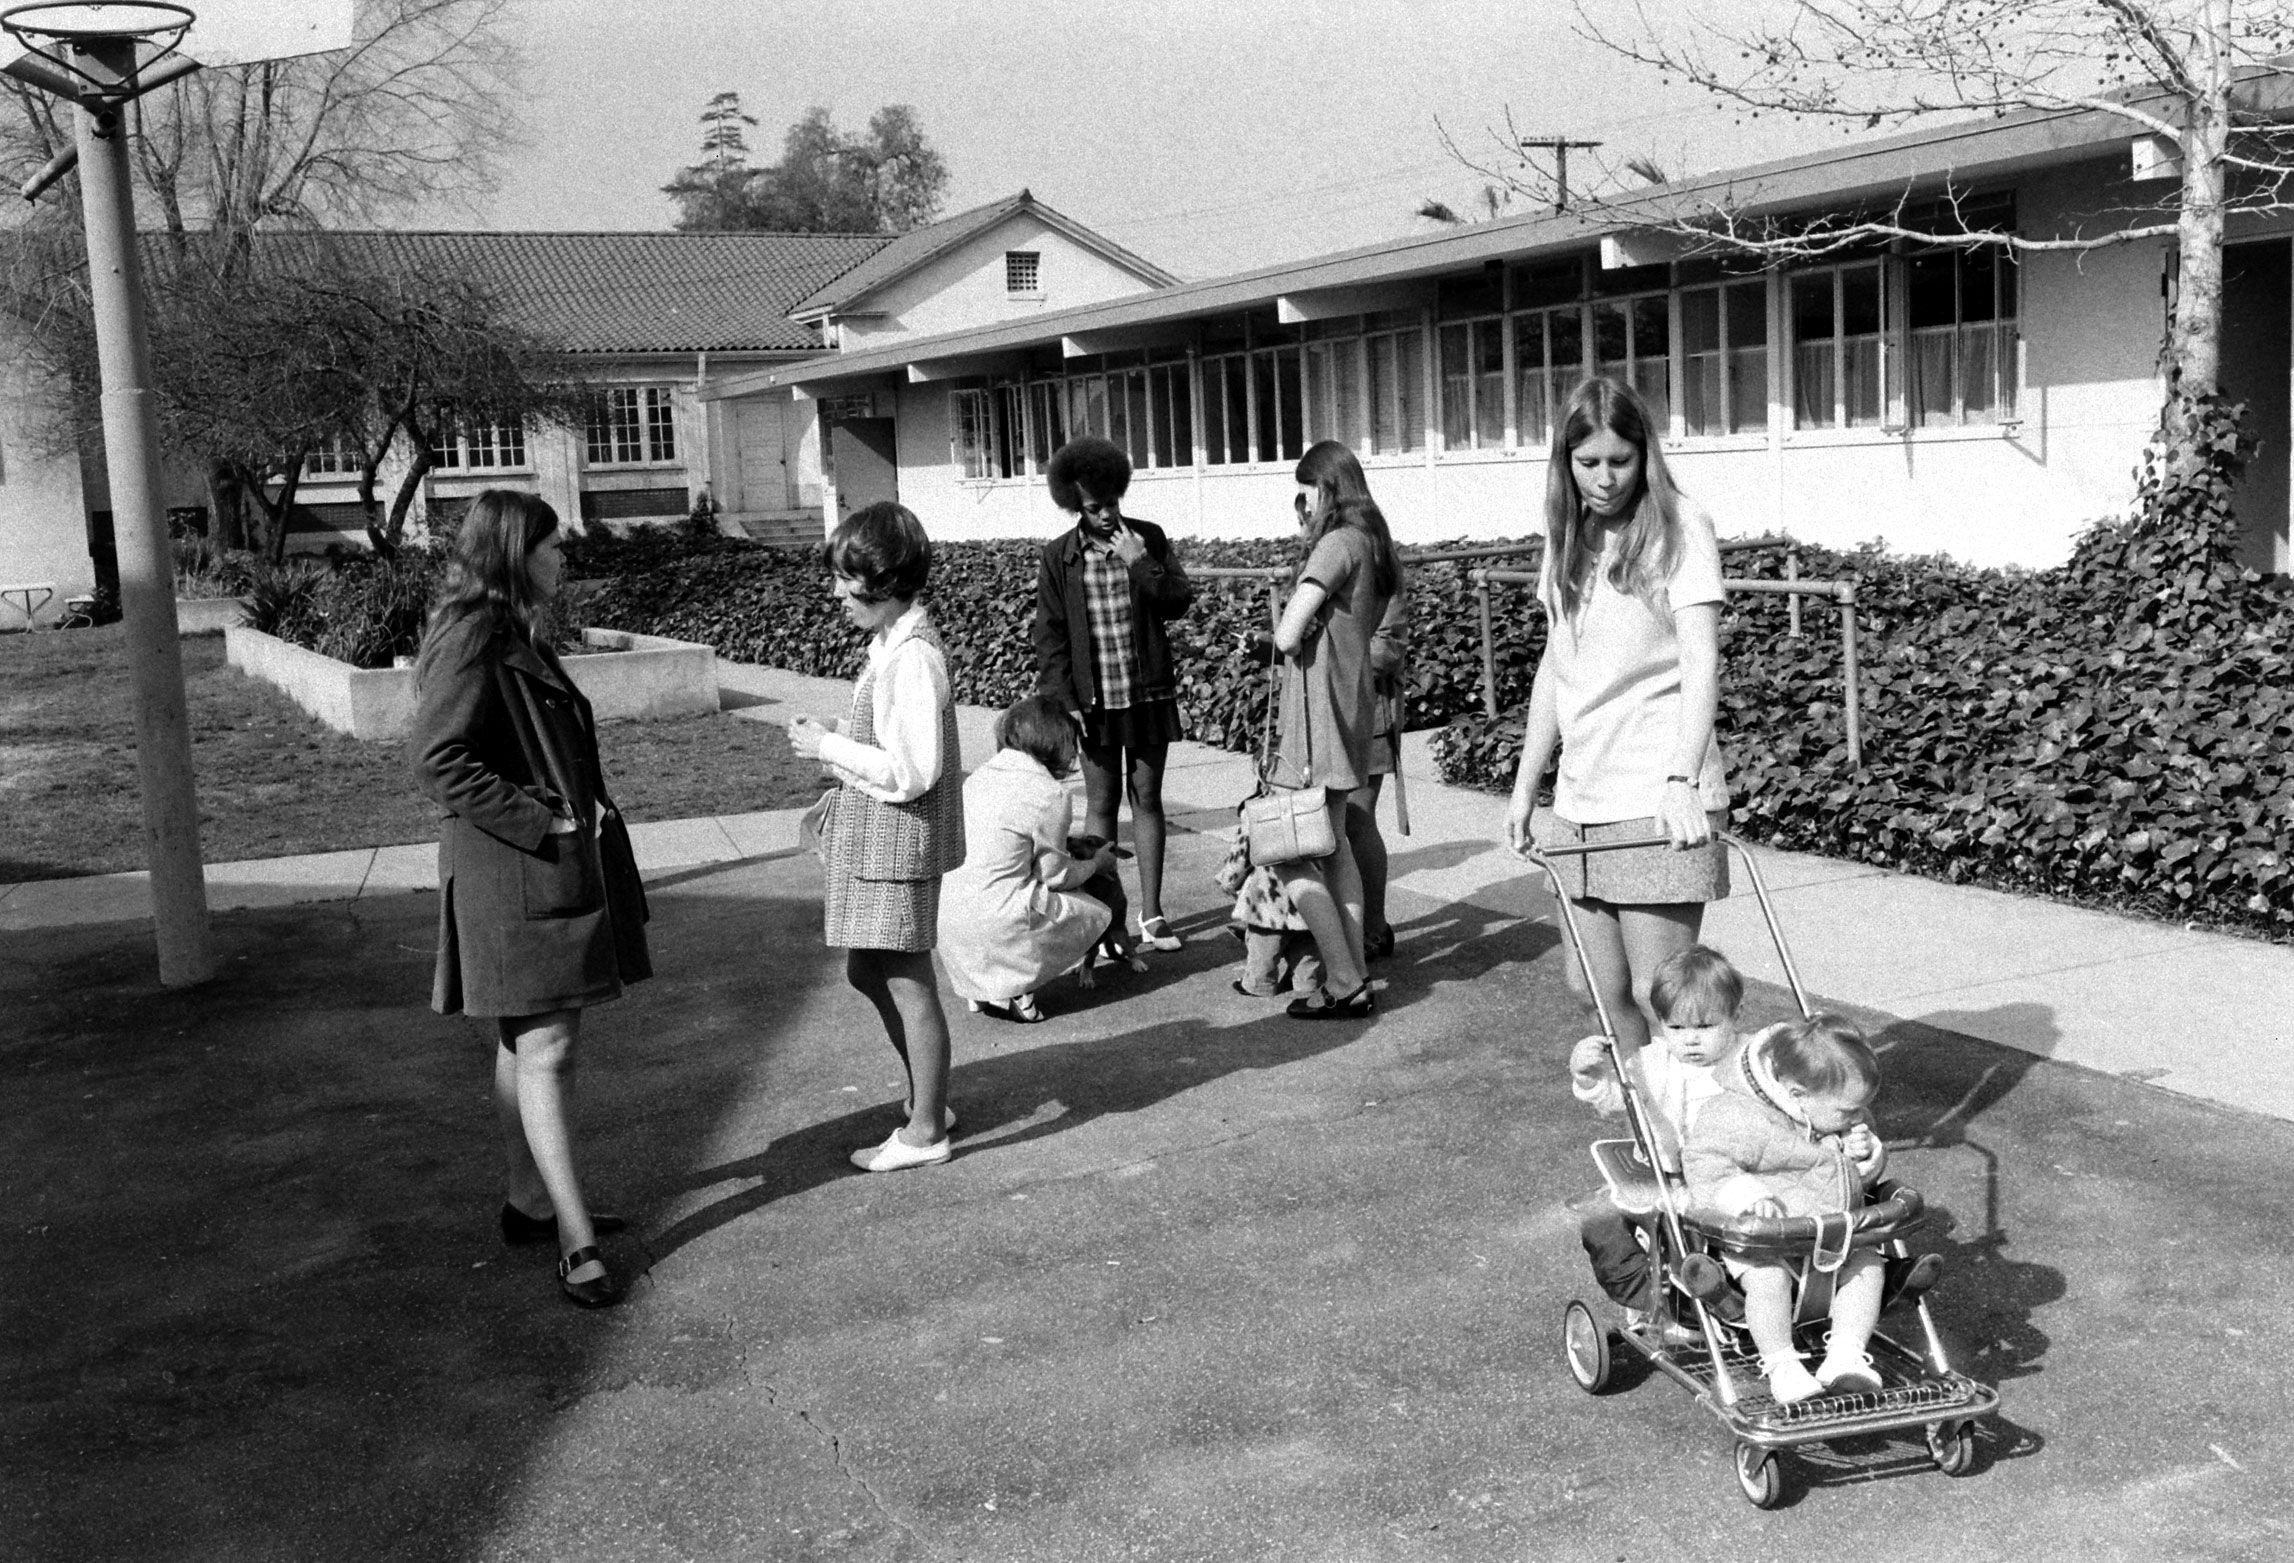 High schoolers with babies, Azusa, Calif., 1971.